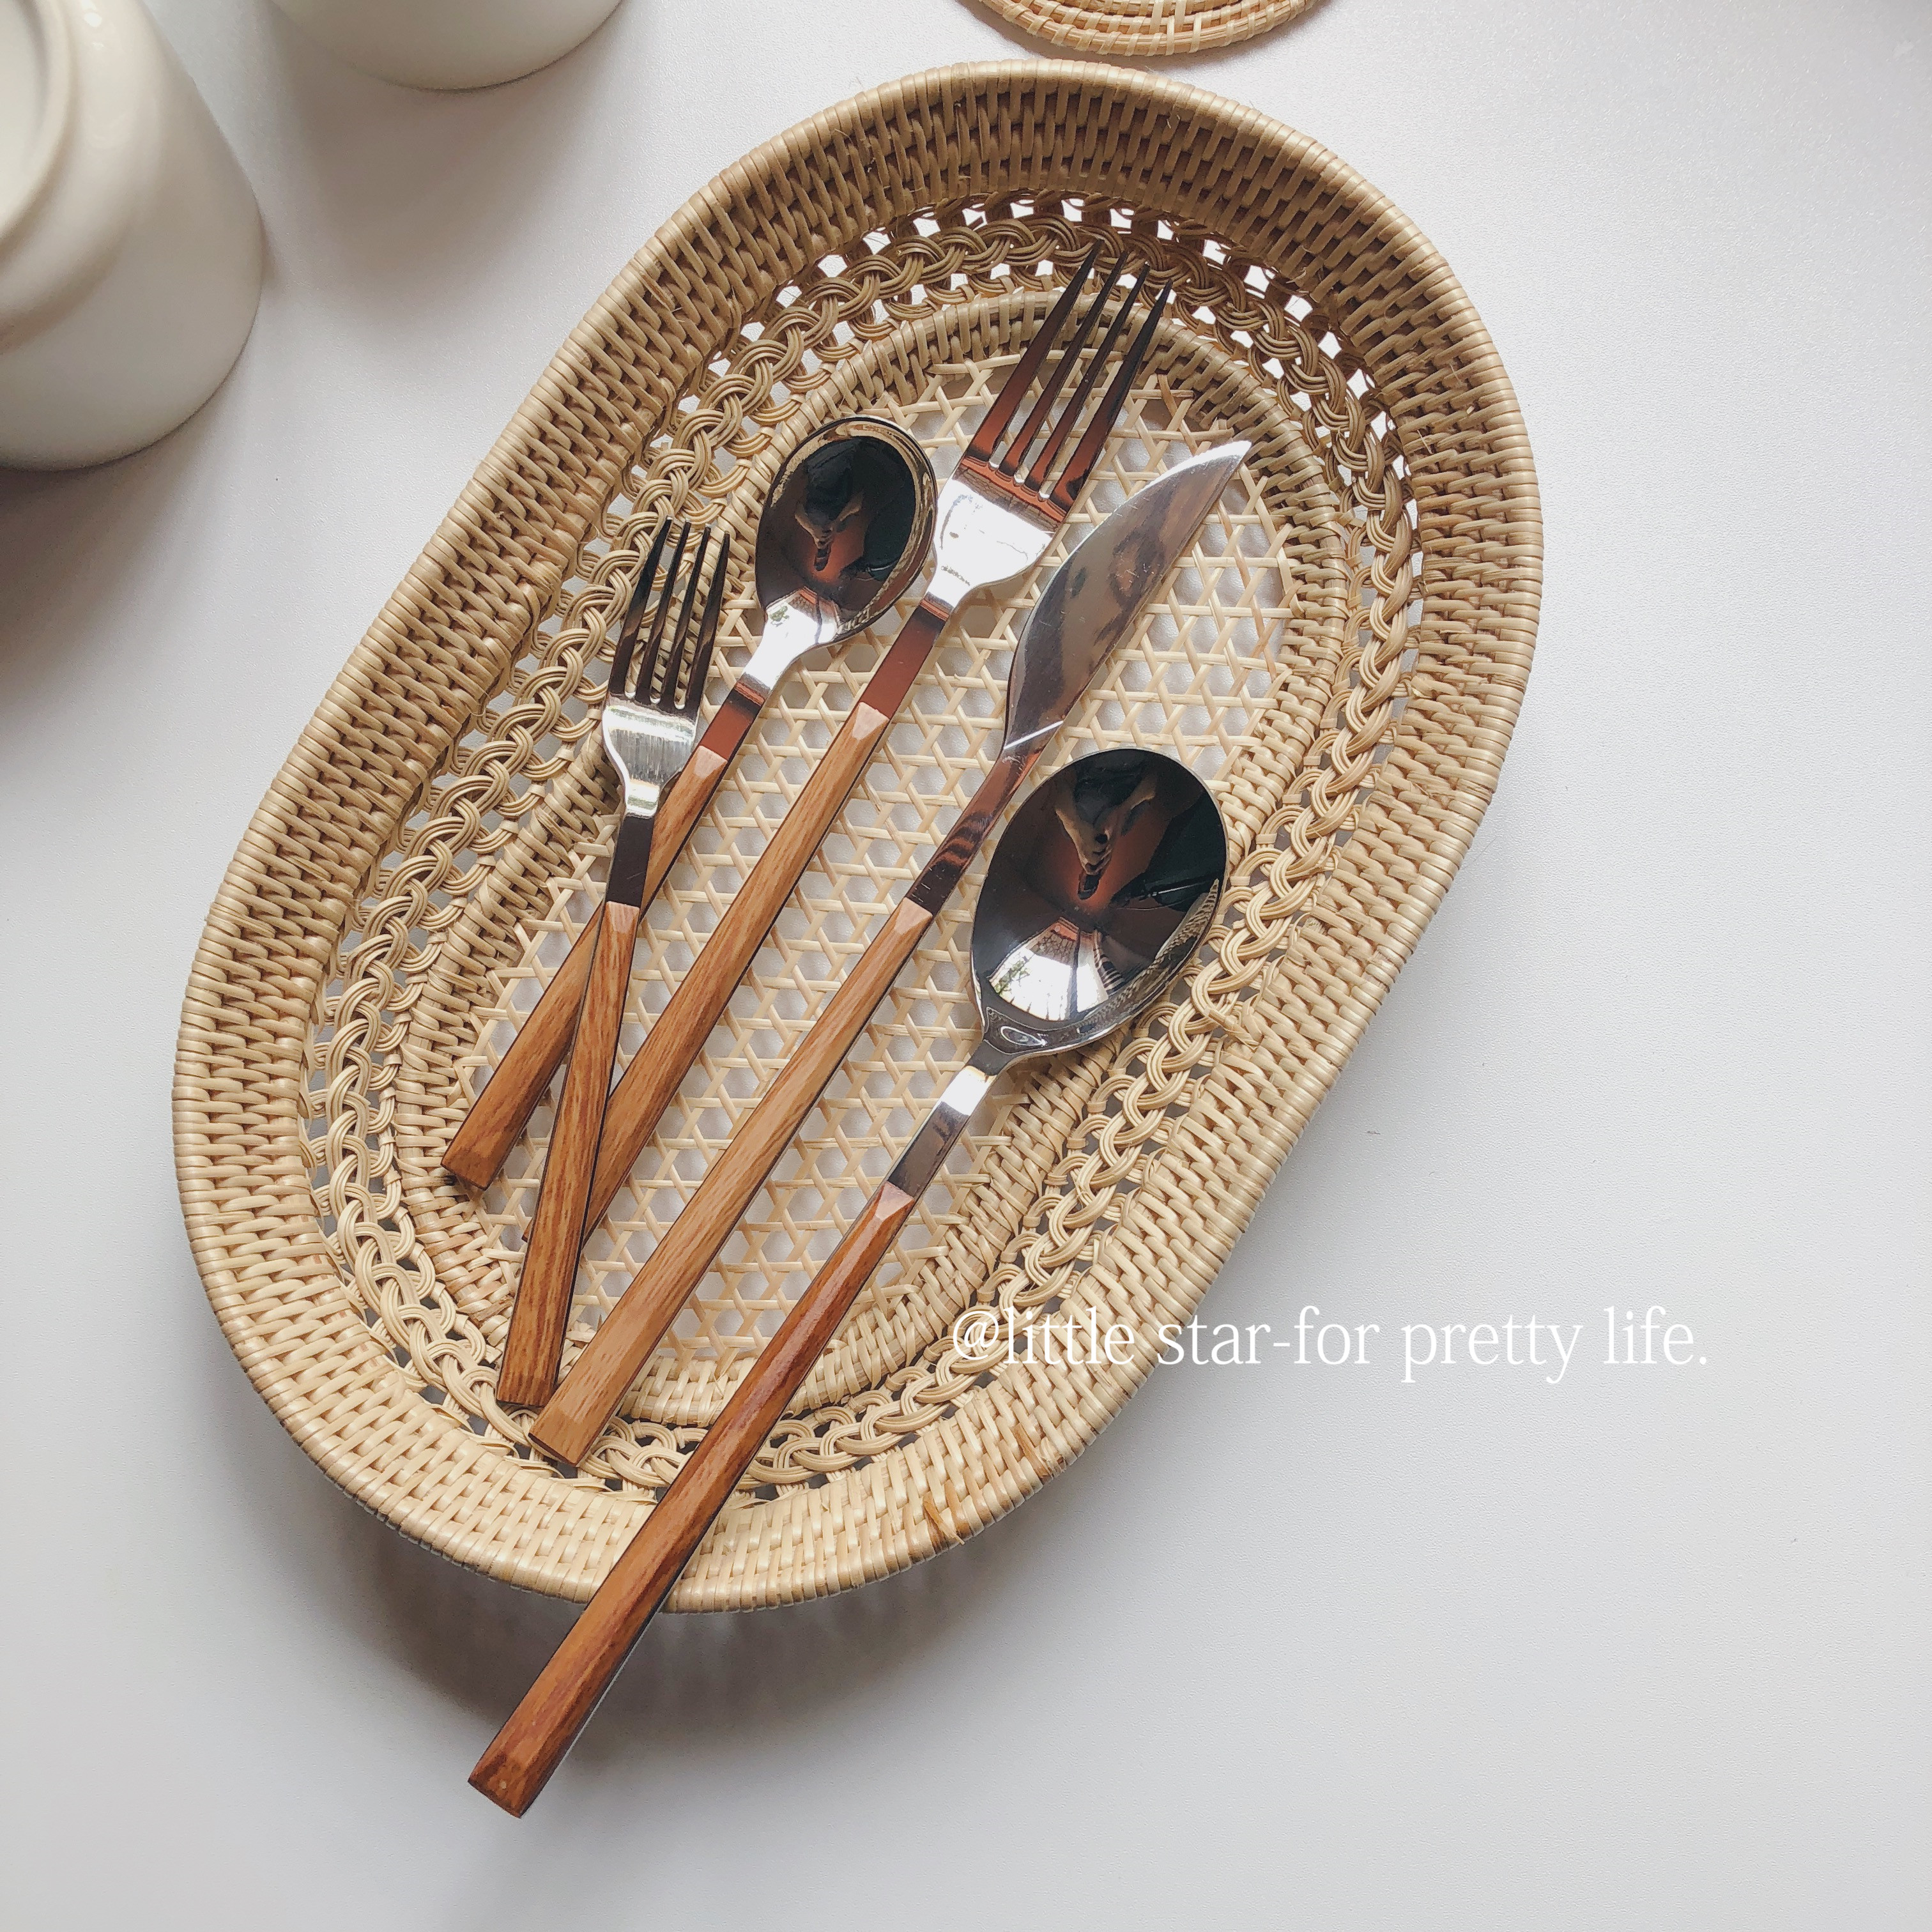 Посуда для детей Артикул 598891350303